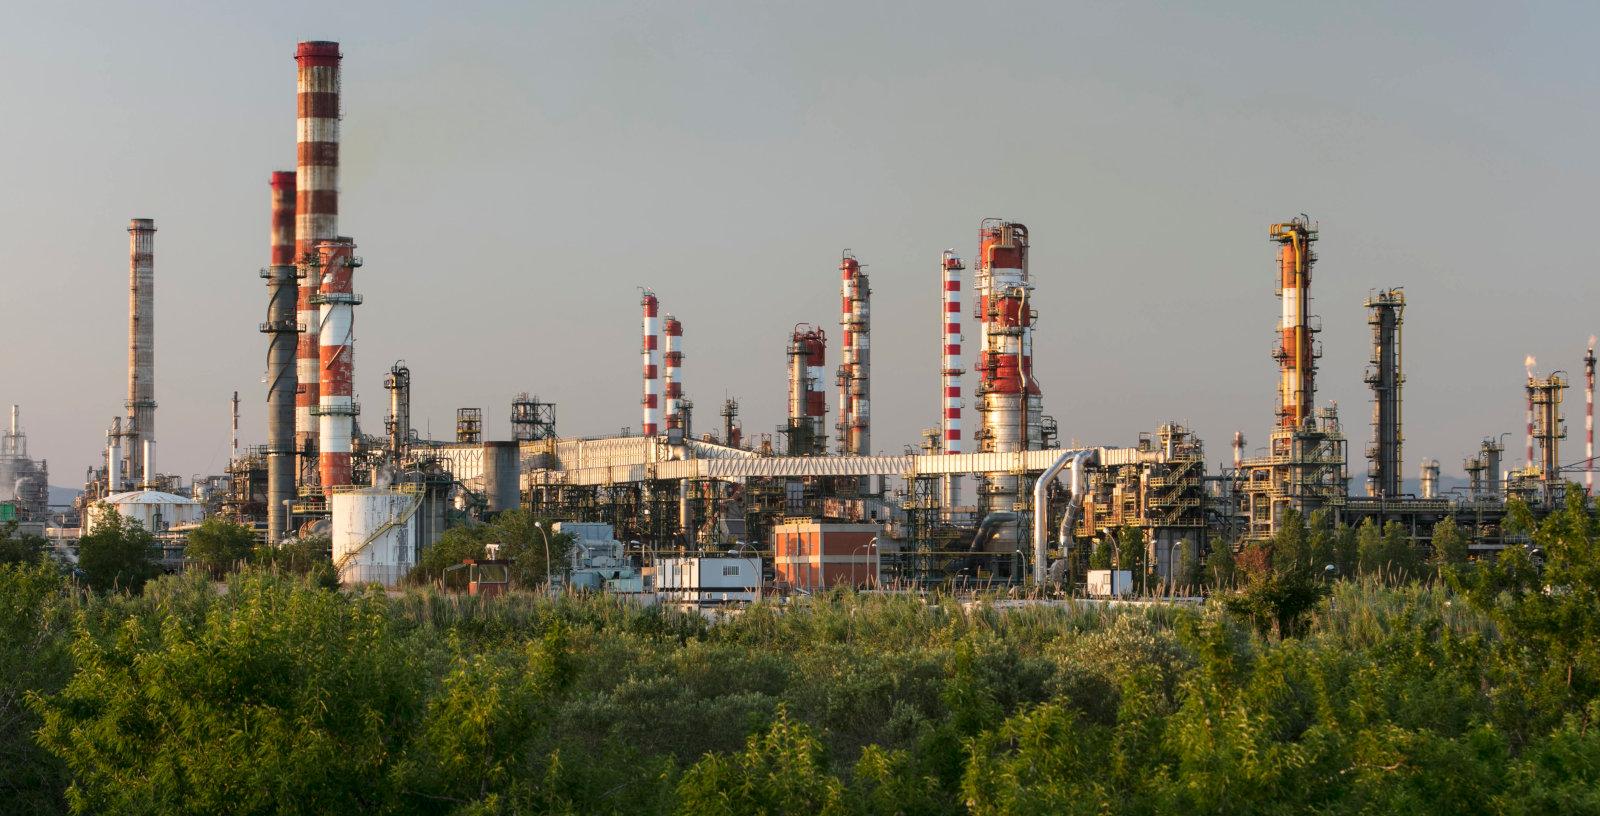 Depropanizer_Column_Tarragona_Refinery_Spain_Repsol_IDOM_00